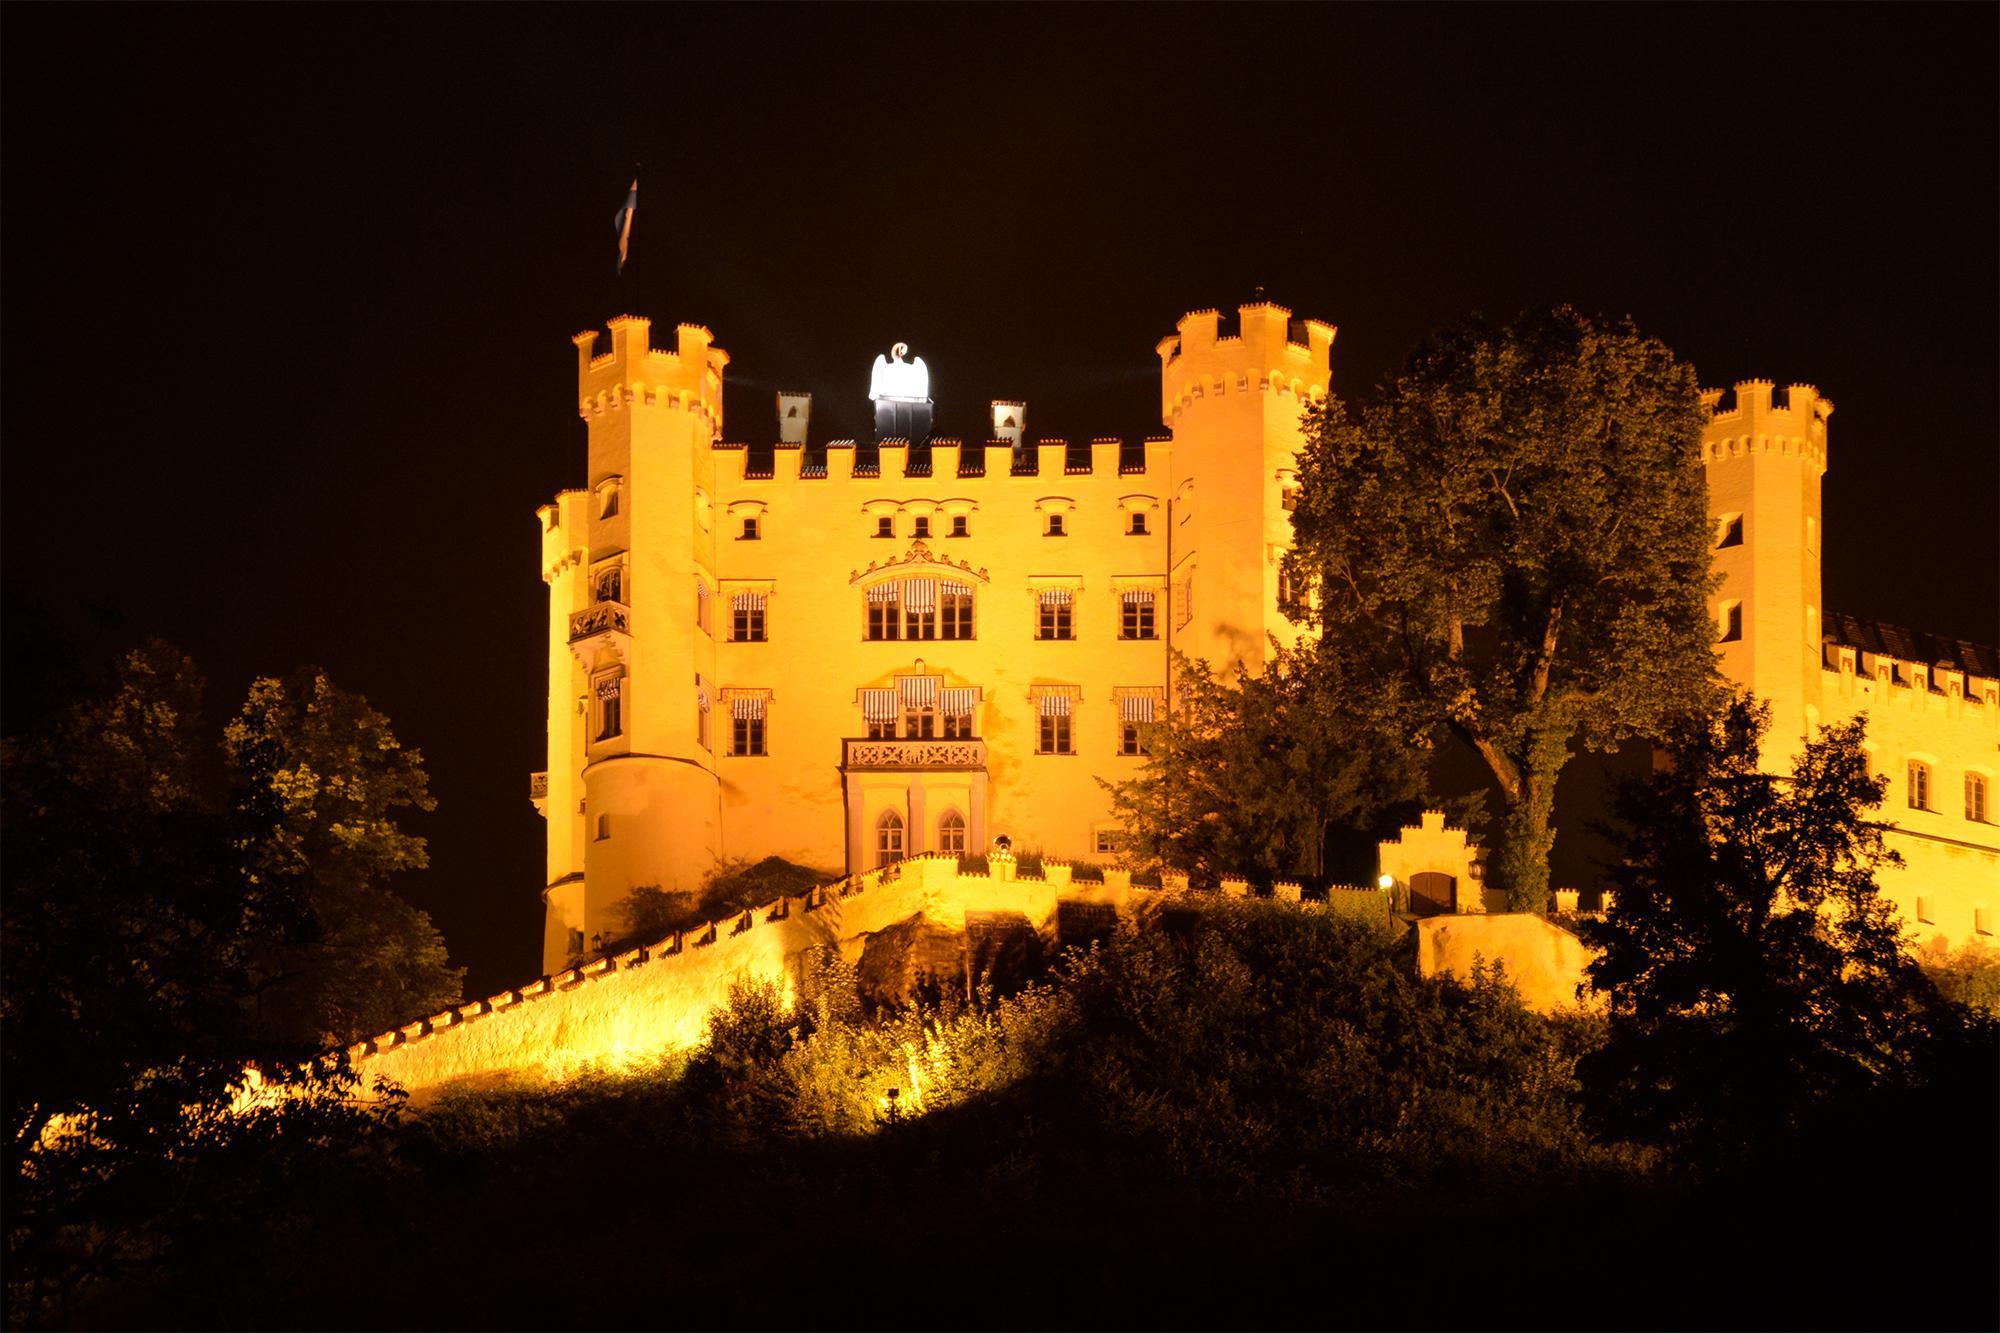 Hohenschwangau Castle, Hohenschwangau, Germany